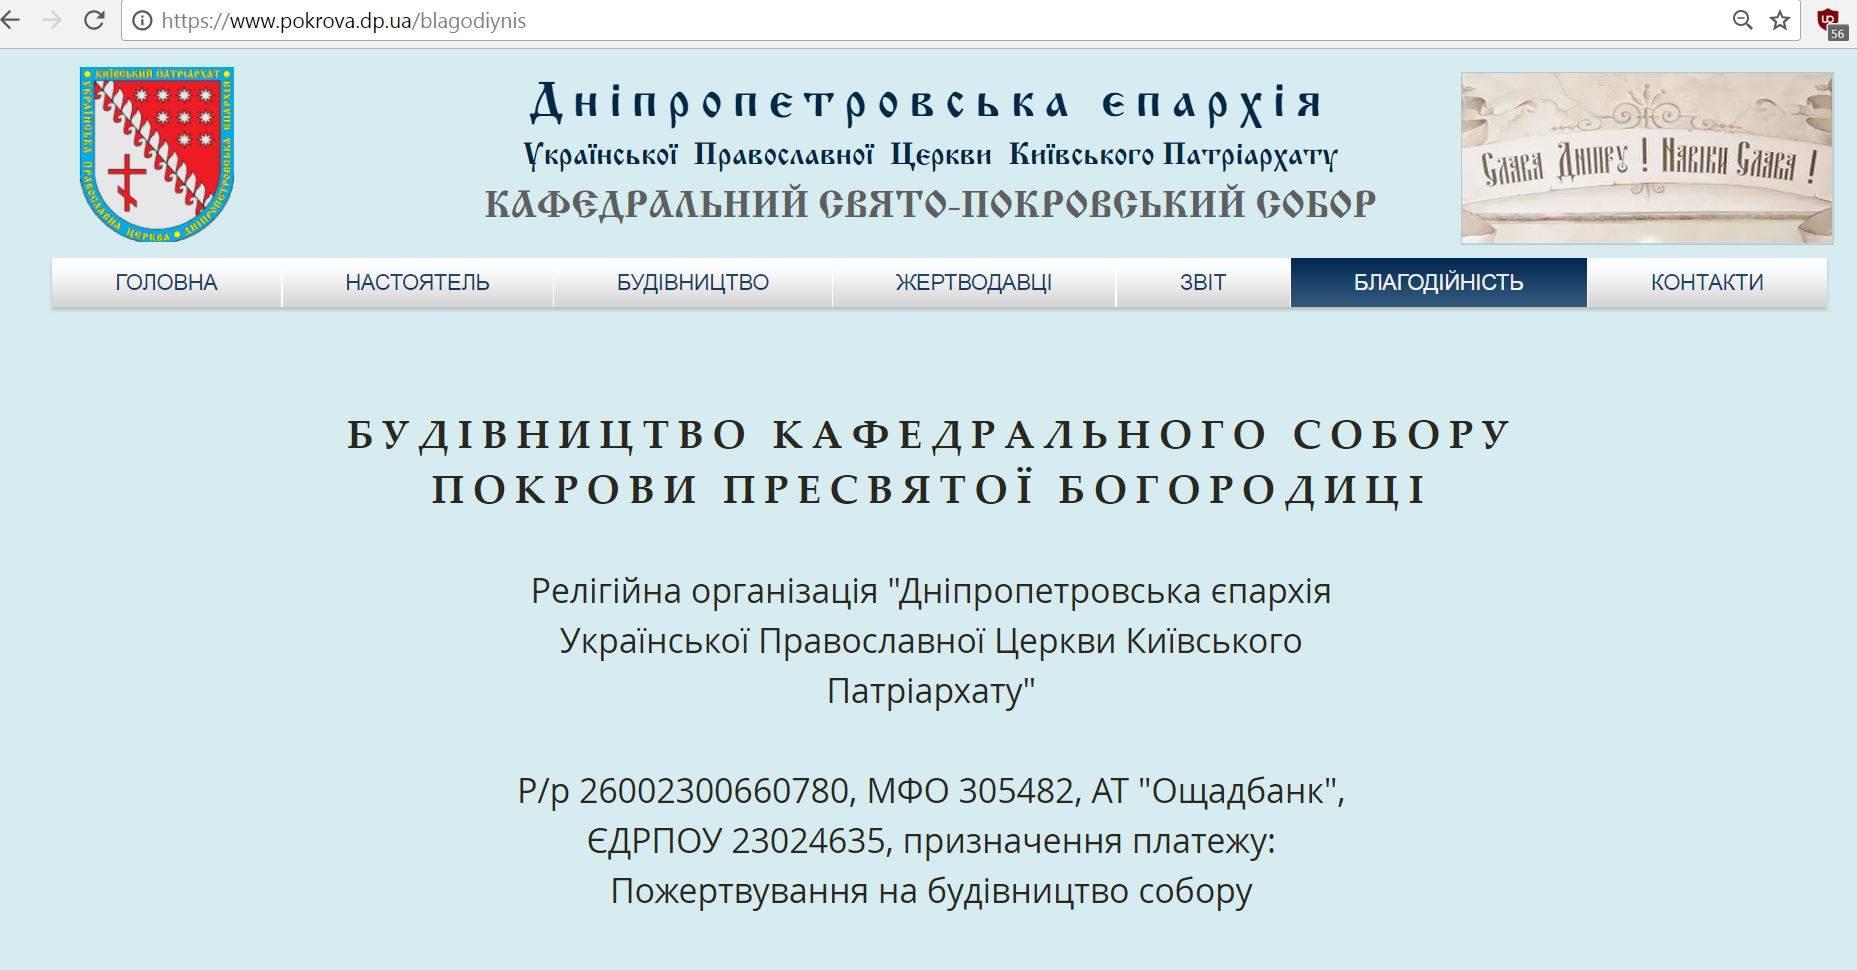 25352335_1539389276126666_3170542437366447080_o